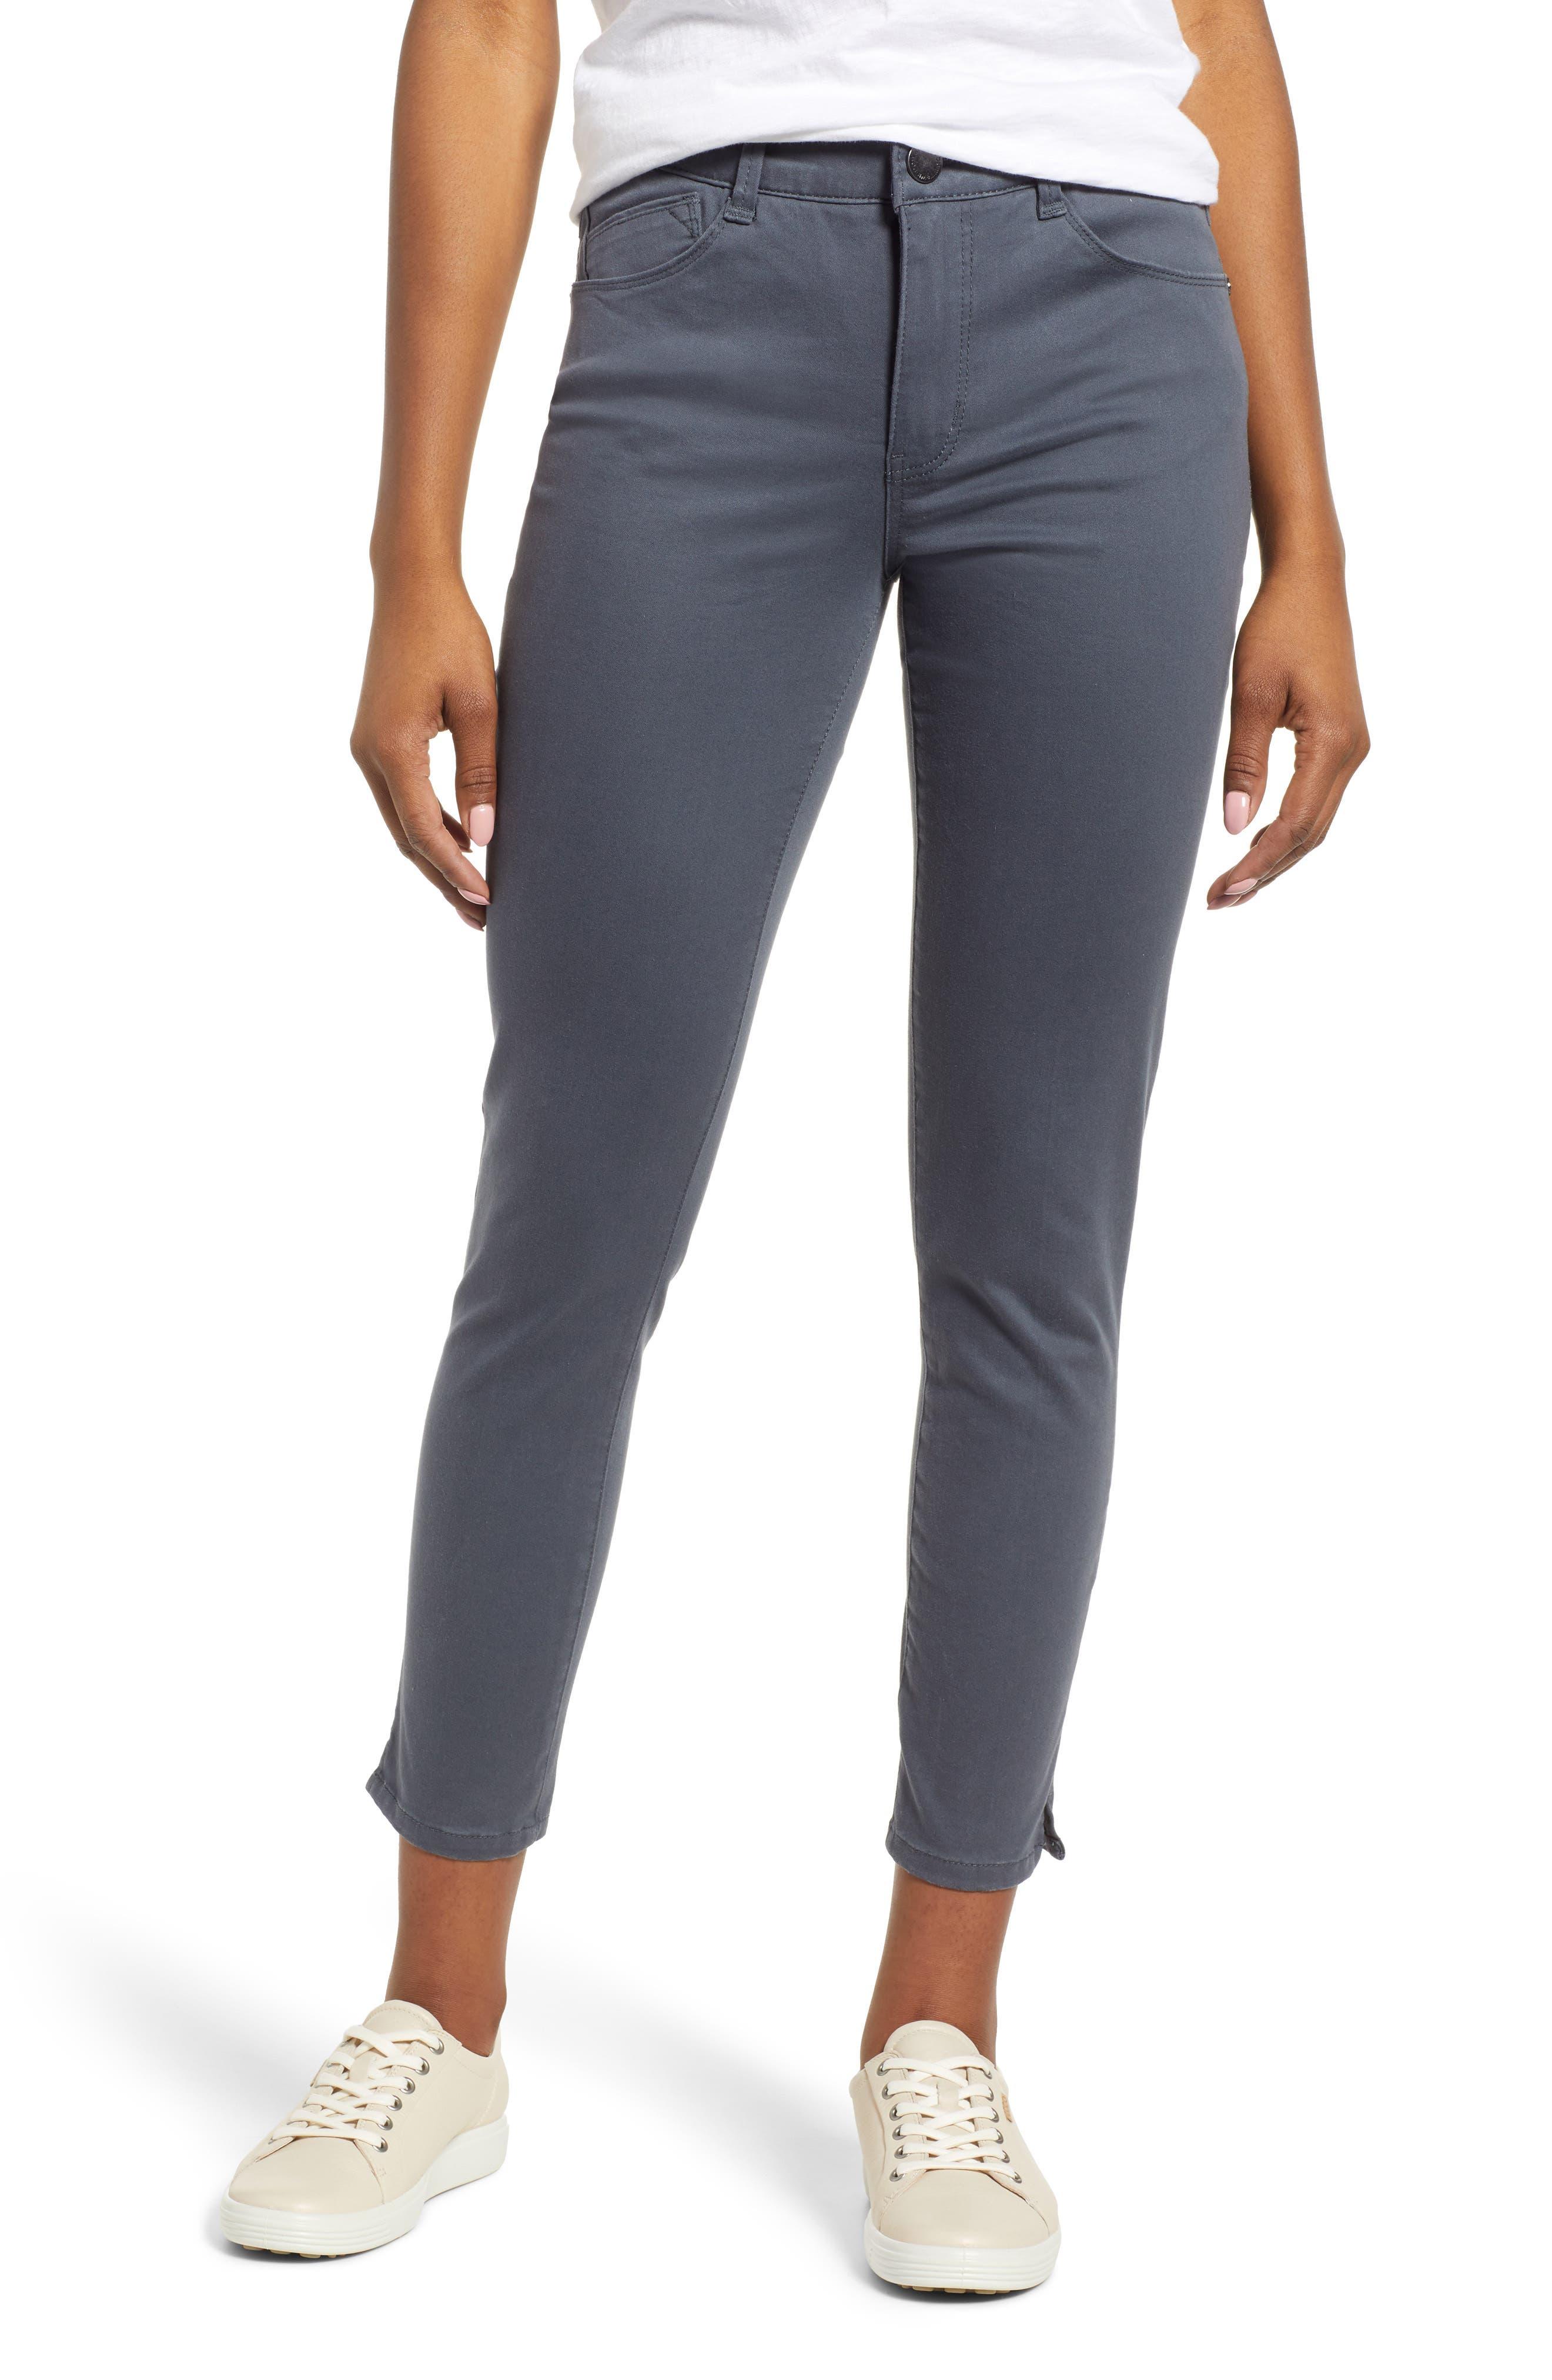 Petite Women's Wit & Wisdom Ab-Solution High Waist Ankle Skinny Pants,  0P - Grey (Regular & Petite) (Nordstrom Exclusive)